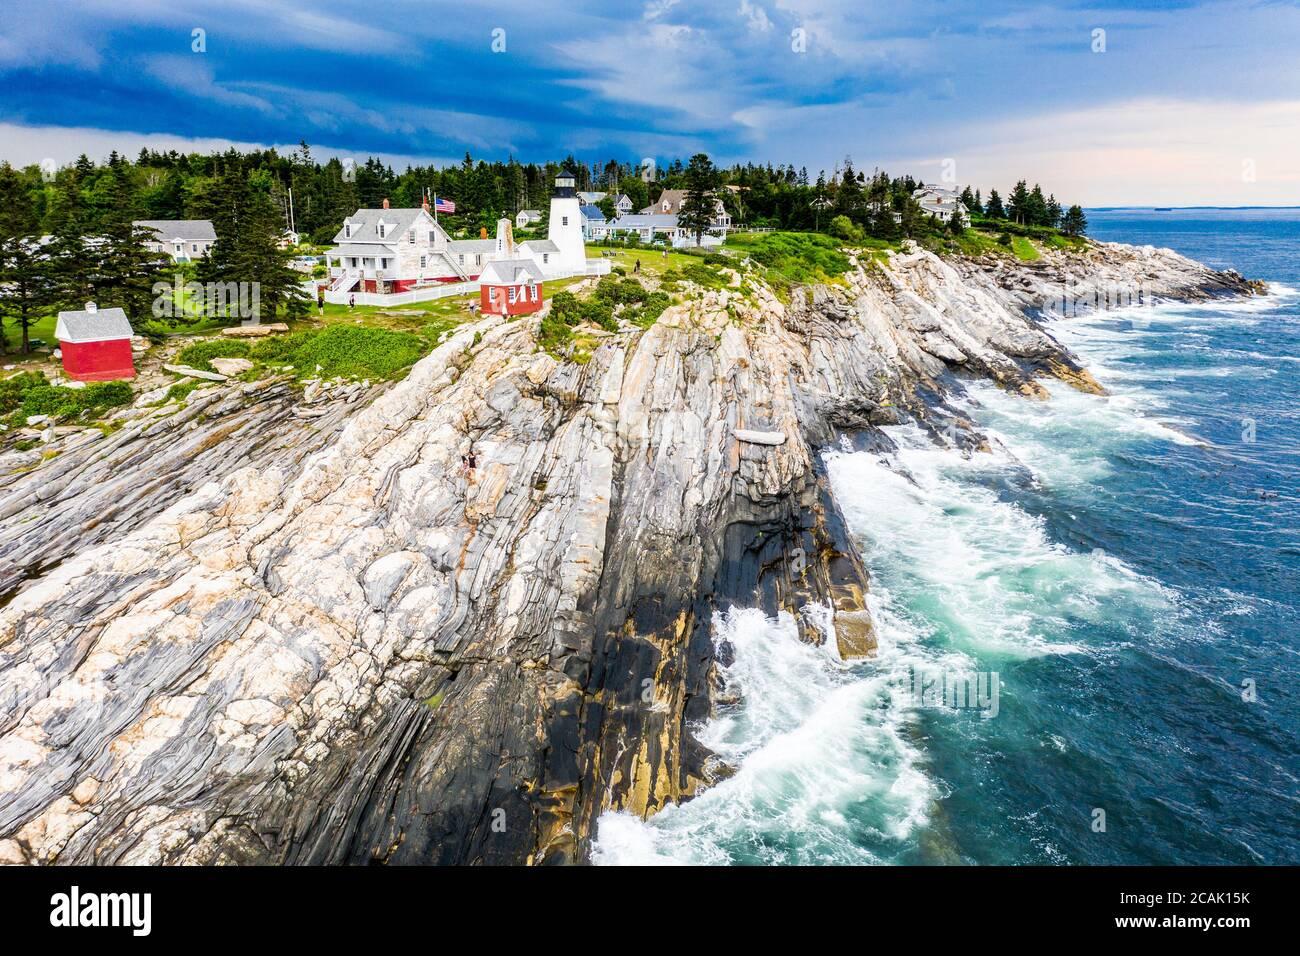 Pemaquid Point Lighthouse, Bristol, Maine, USA Banque D'Images